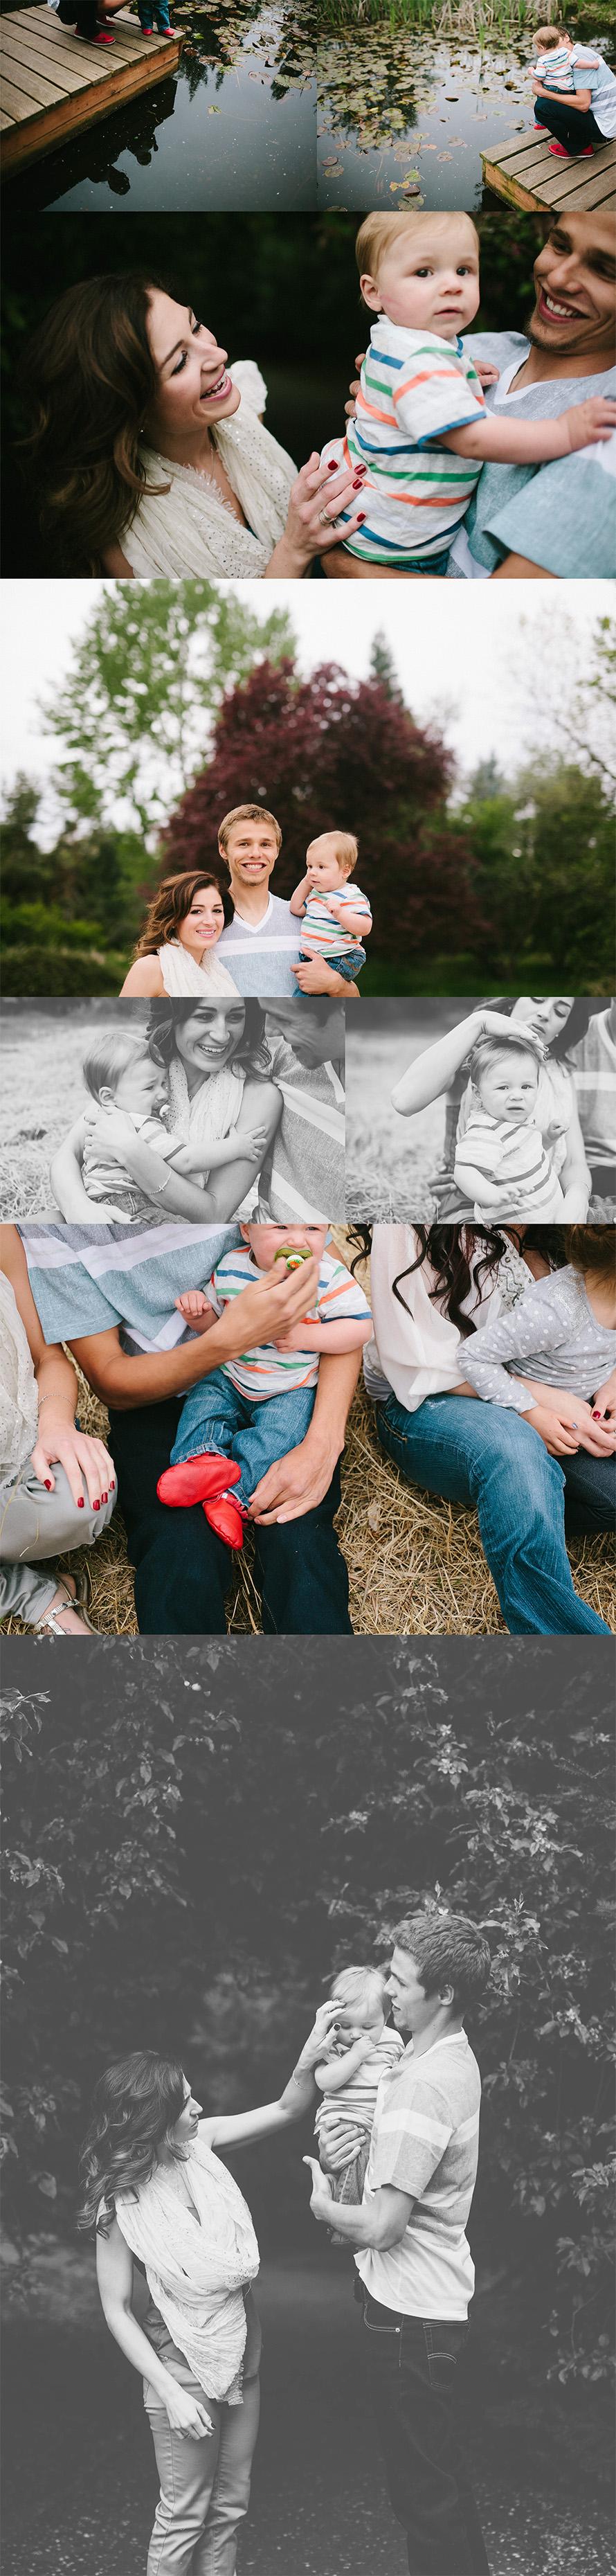 younghipcouplefamilyphotographerplanotexas